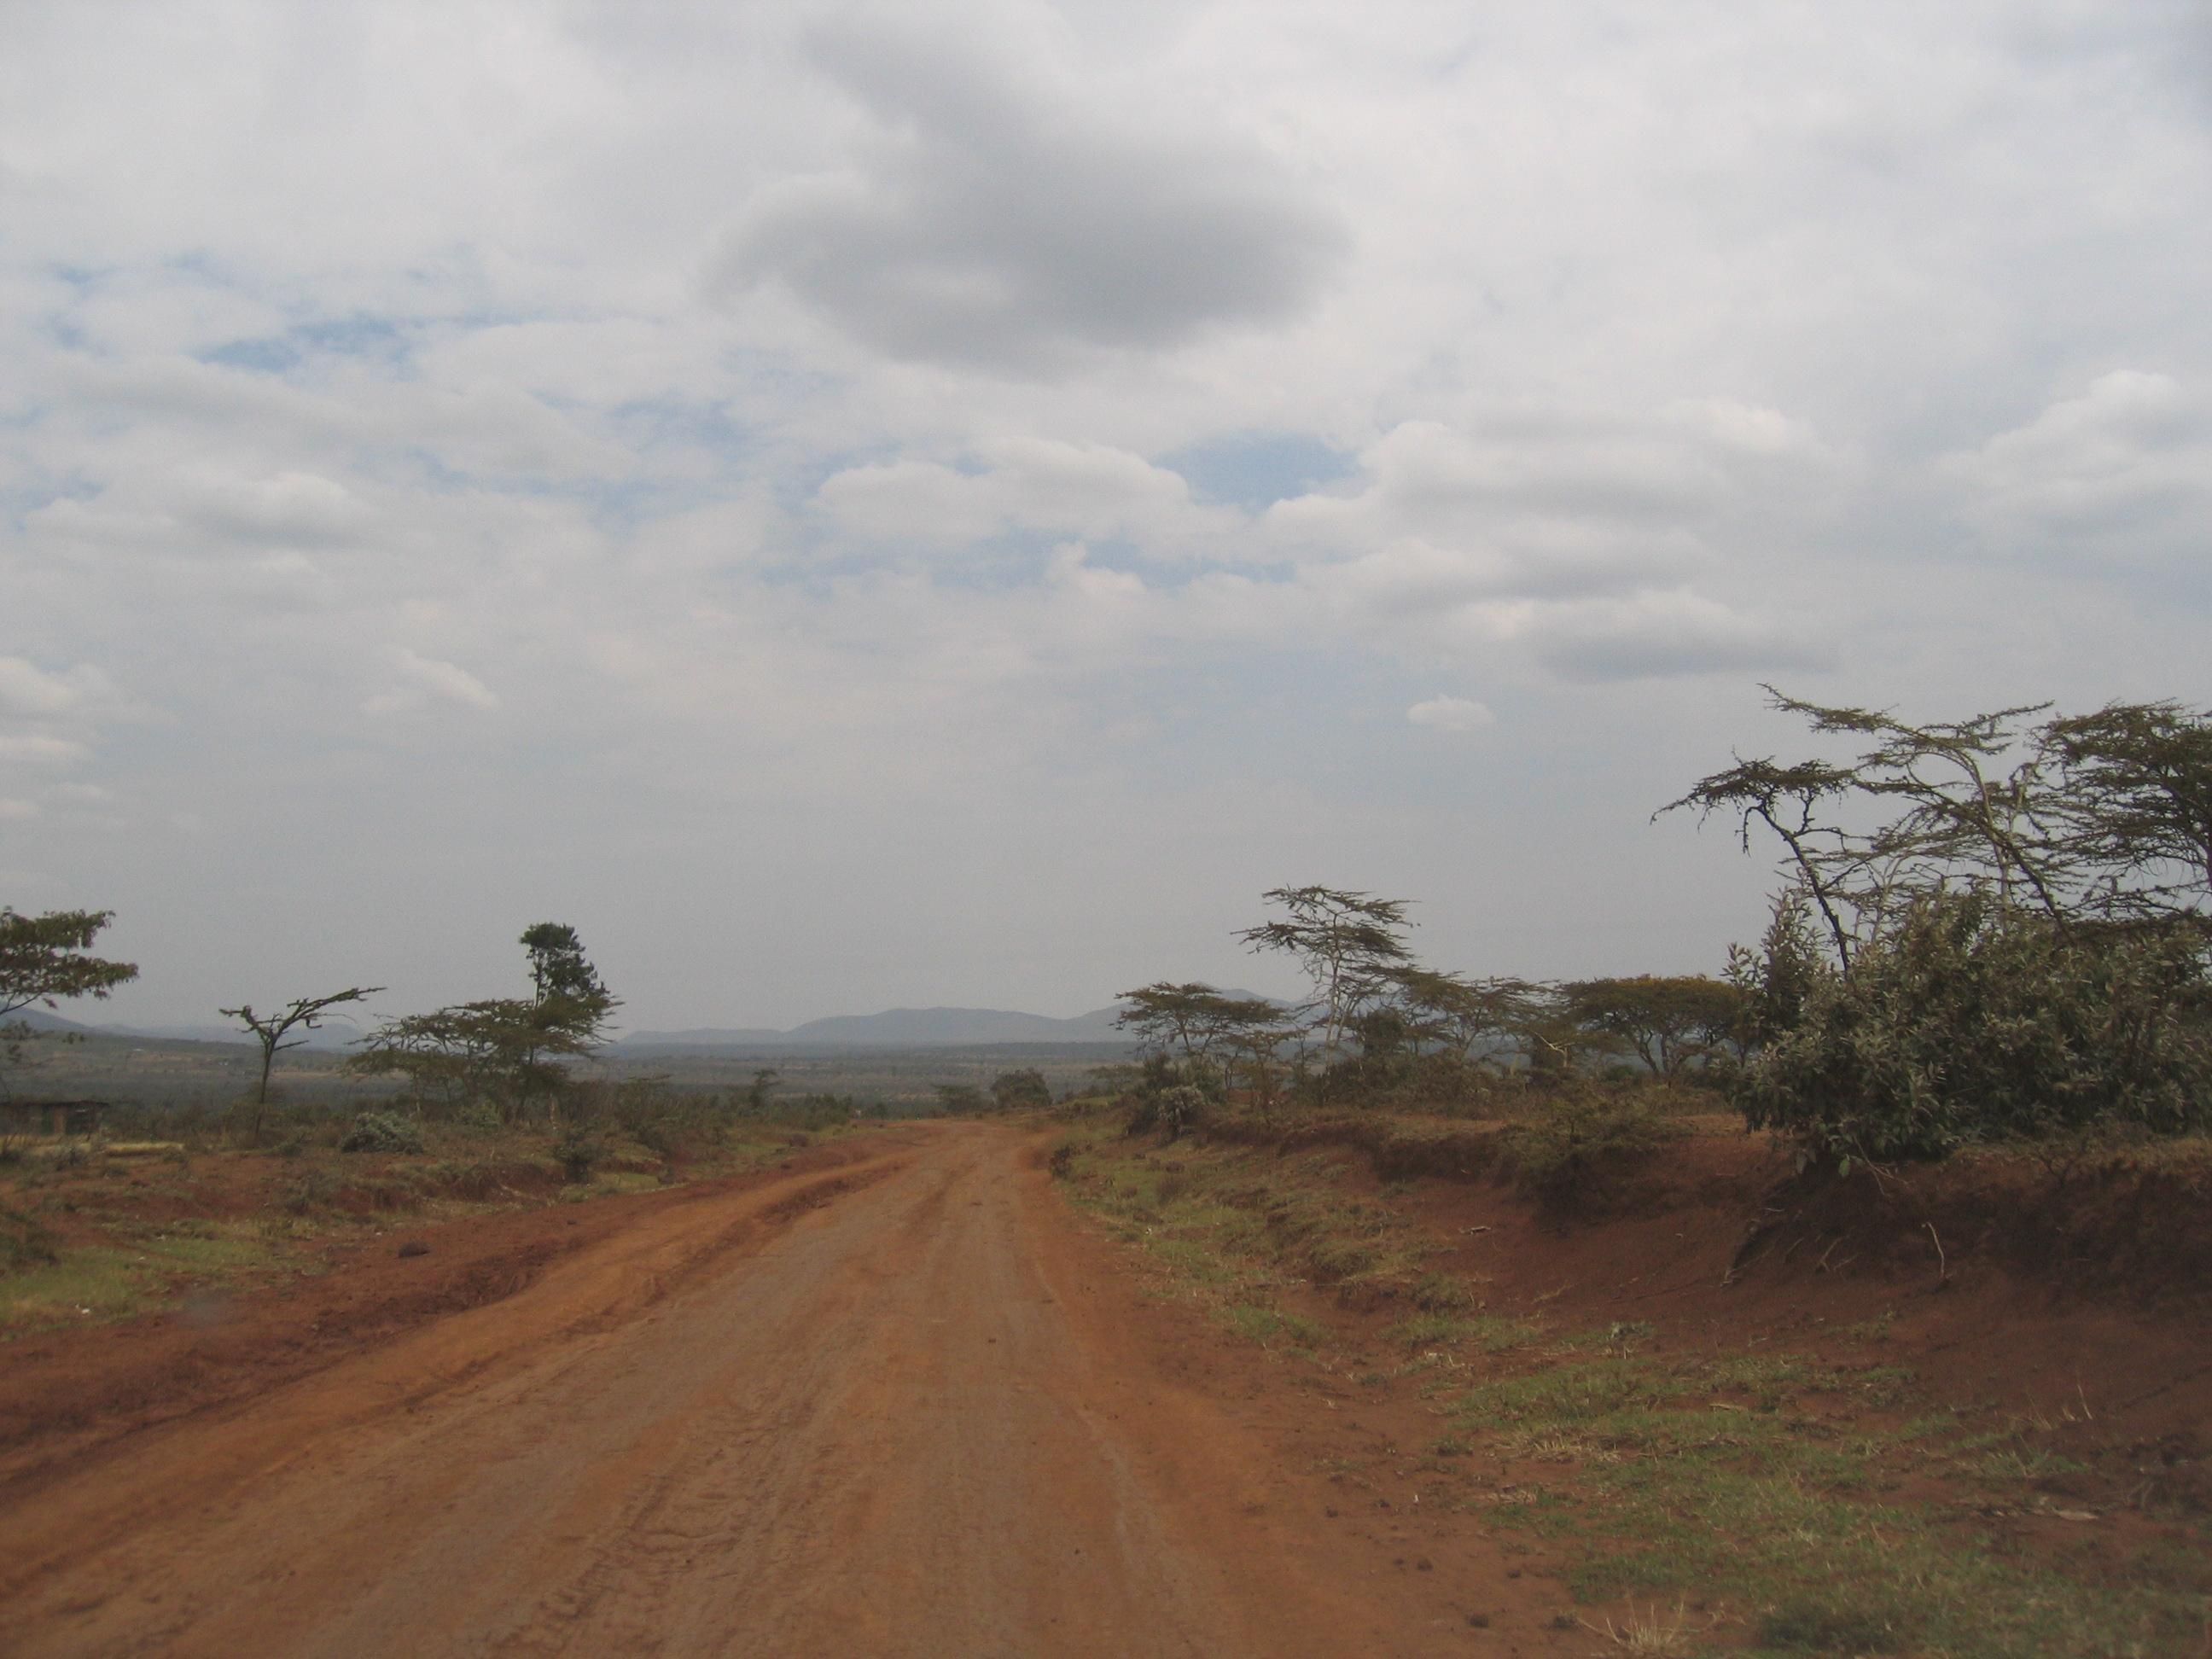 kenya_riftvalley_landscape_02